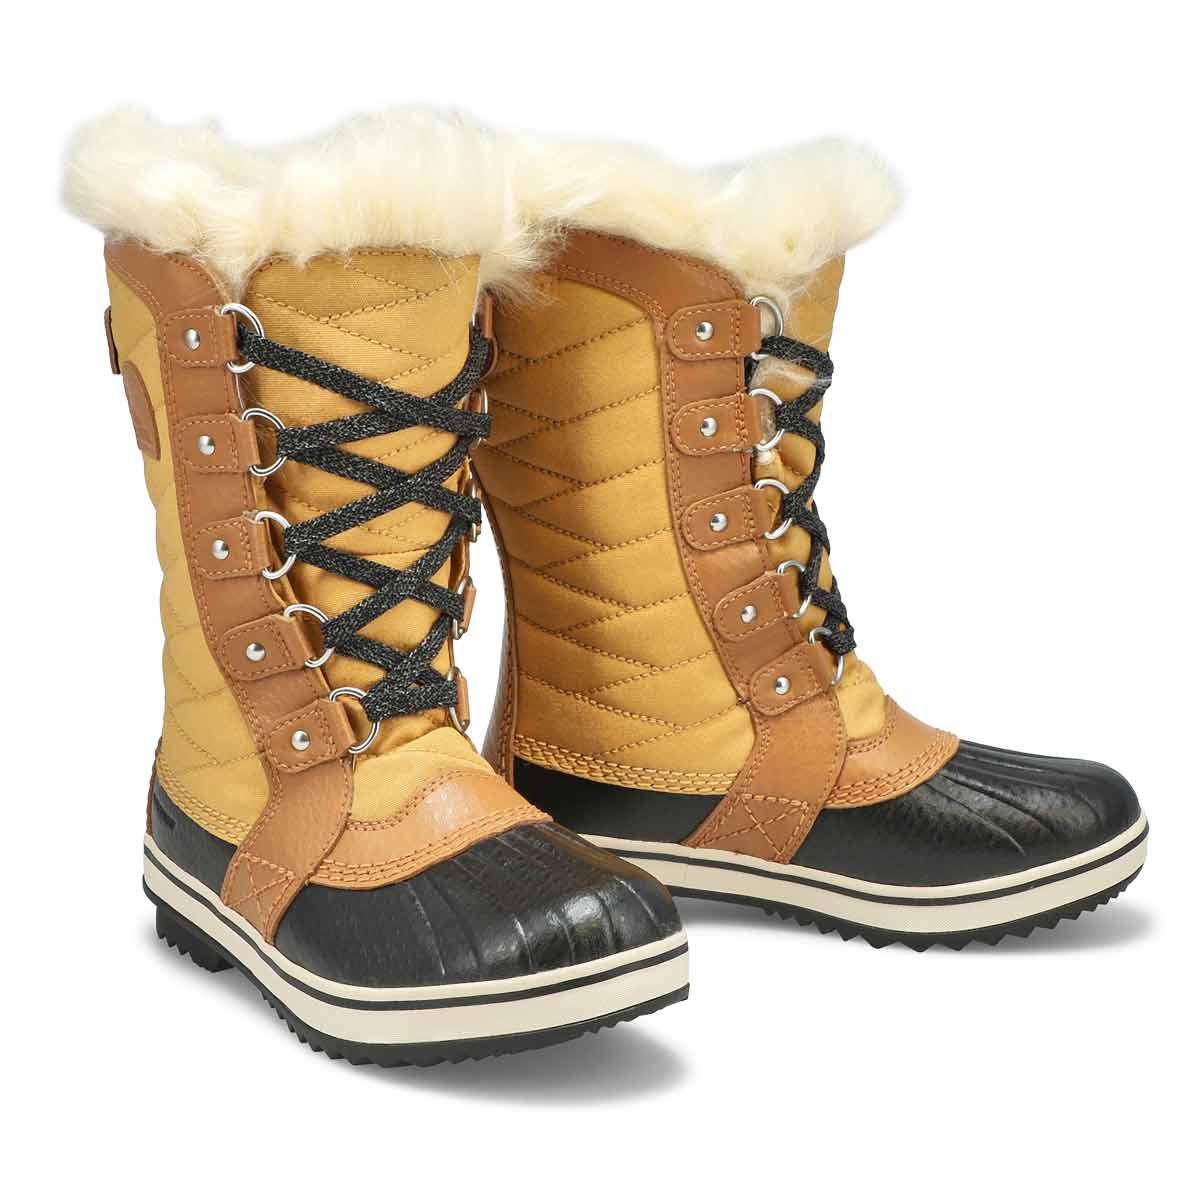 Girls' Tofino II Waterproof Snow Boot - Curry